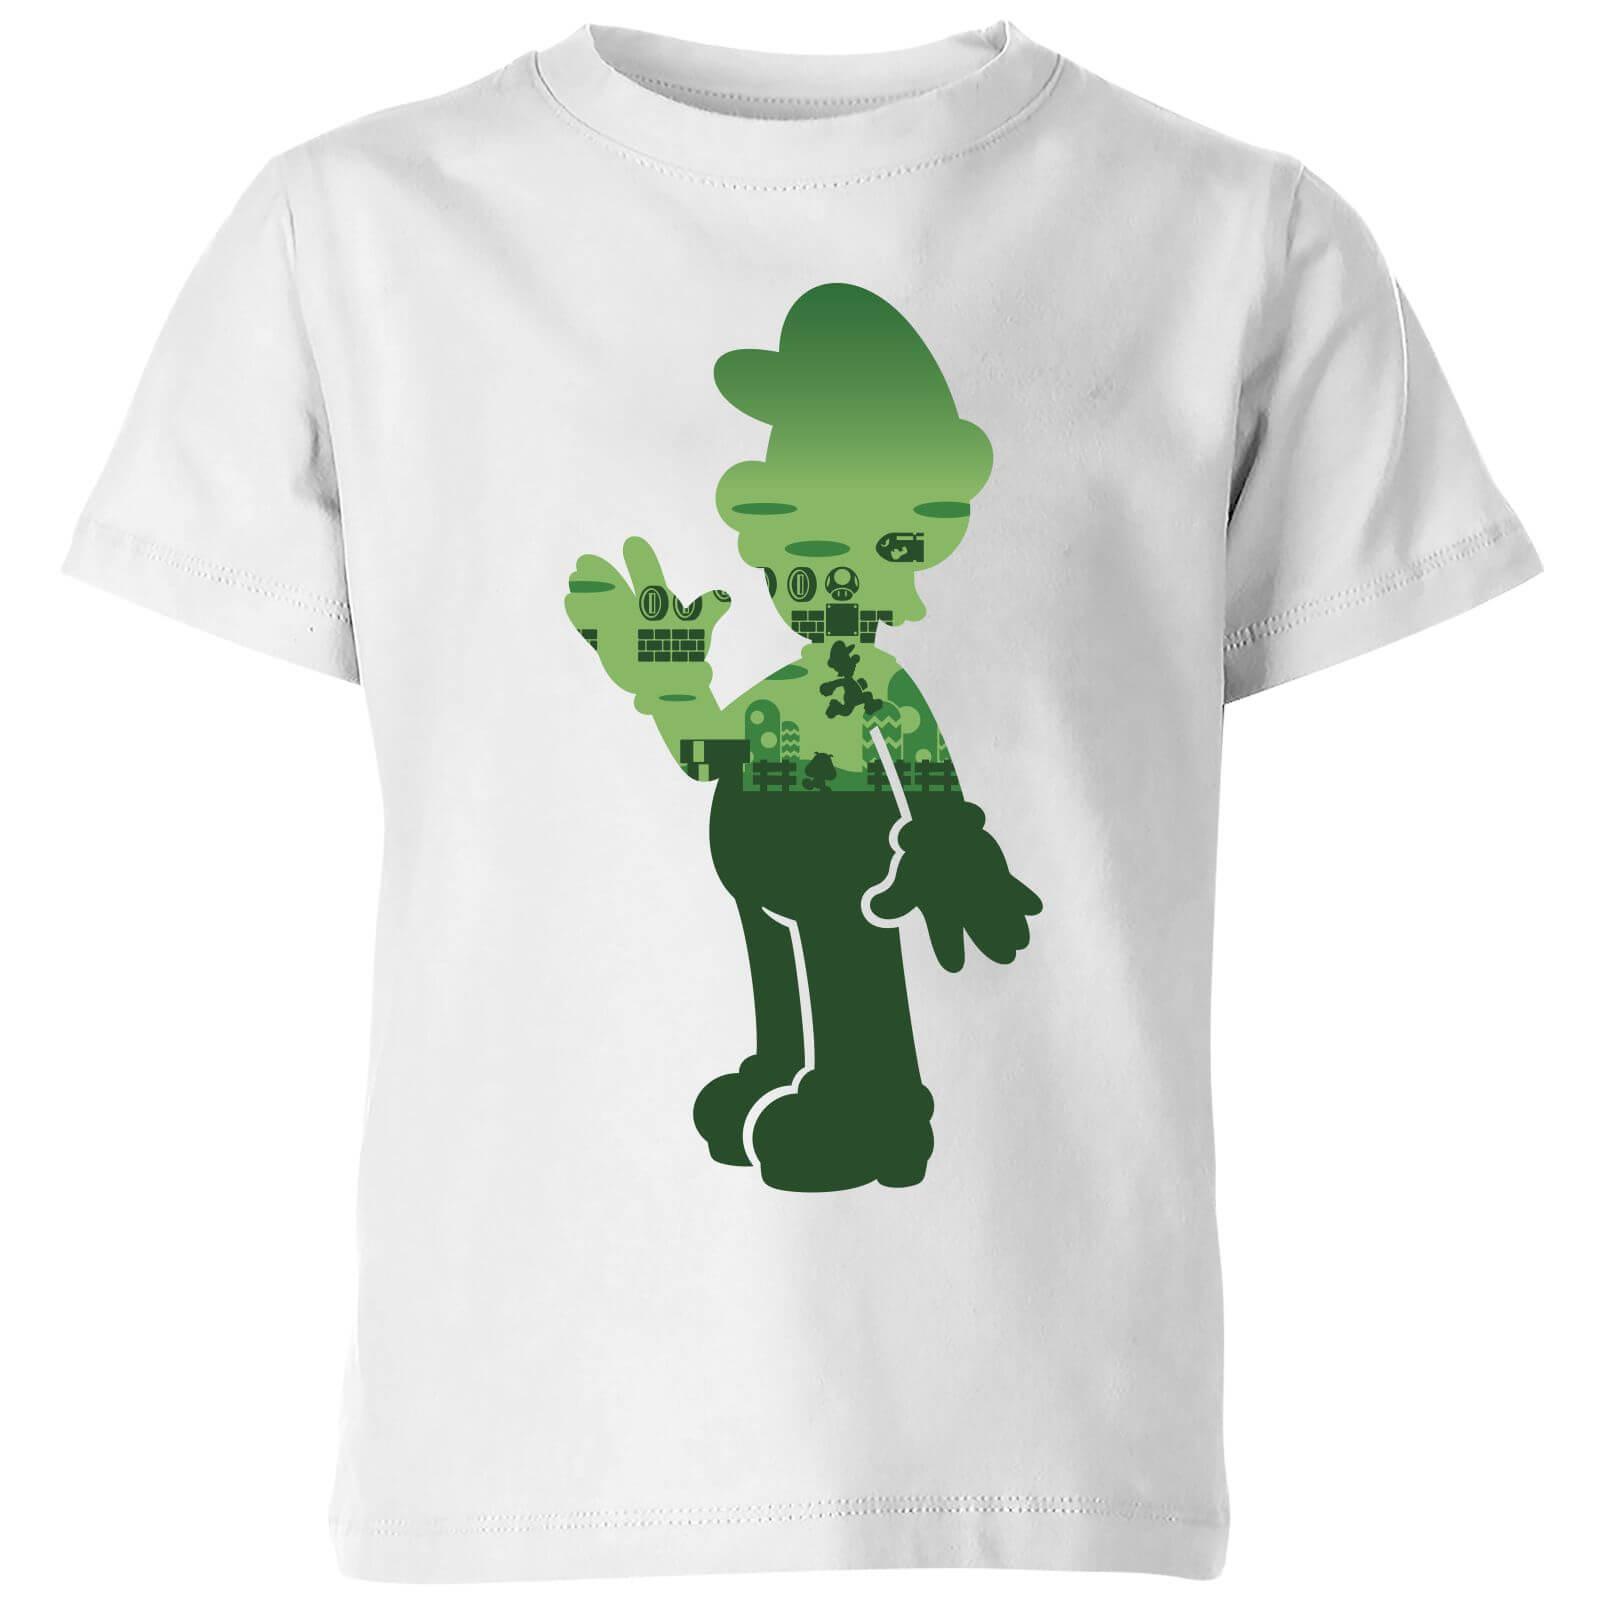 339a35b1f Nintendo Super Mario Luigi Silhouette Kid's T-Shirt - White   IWOOT